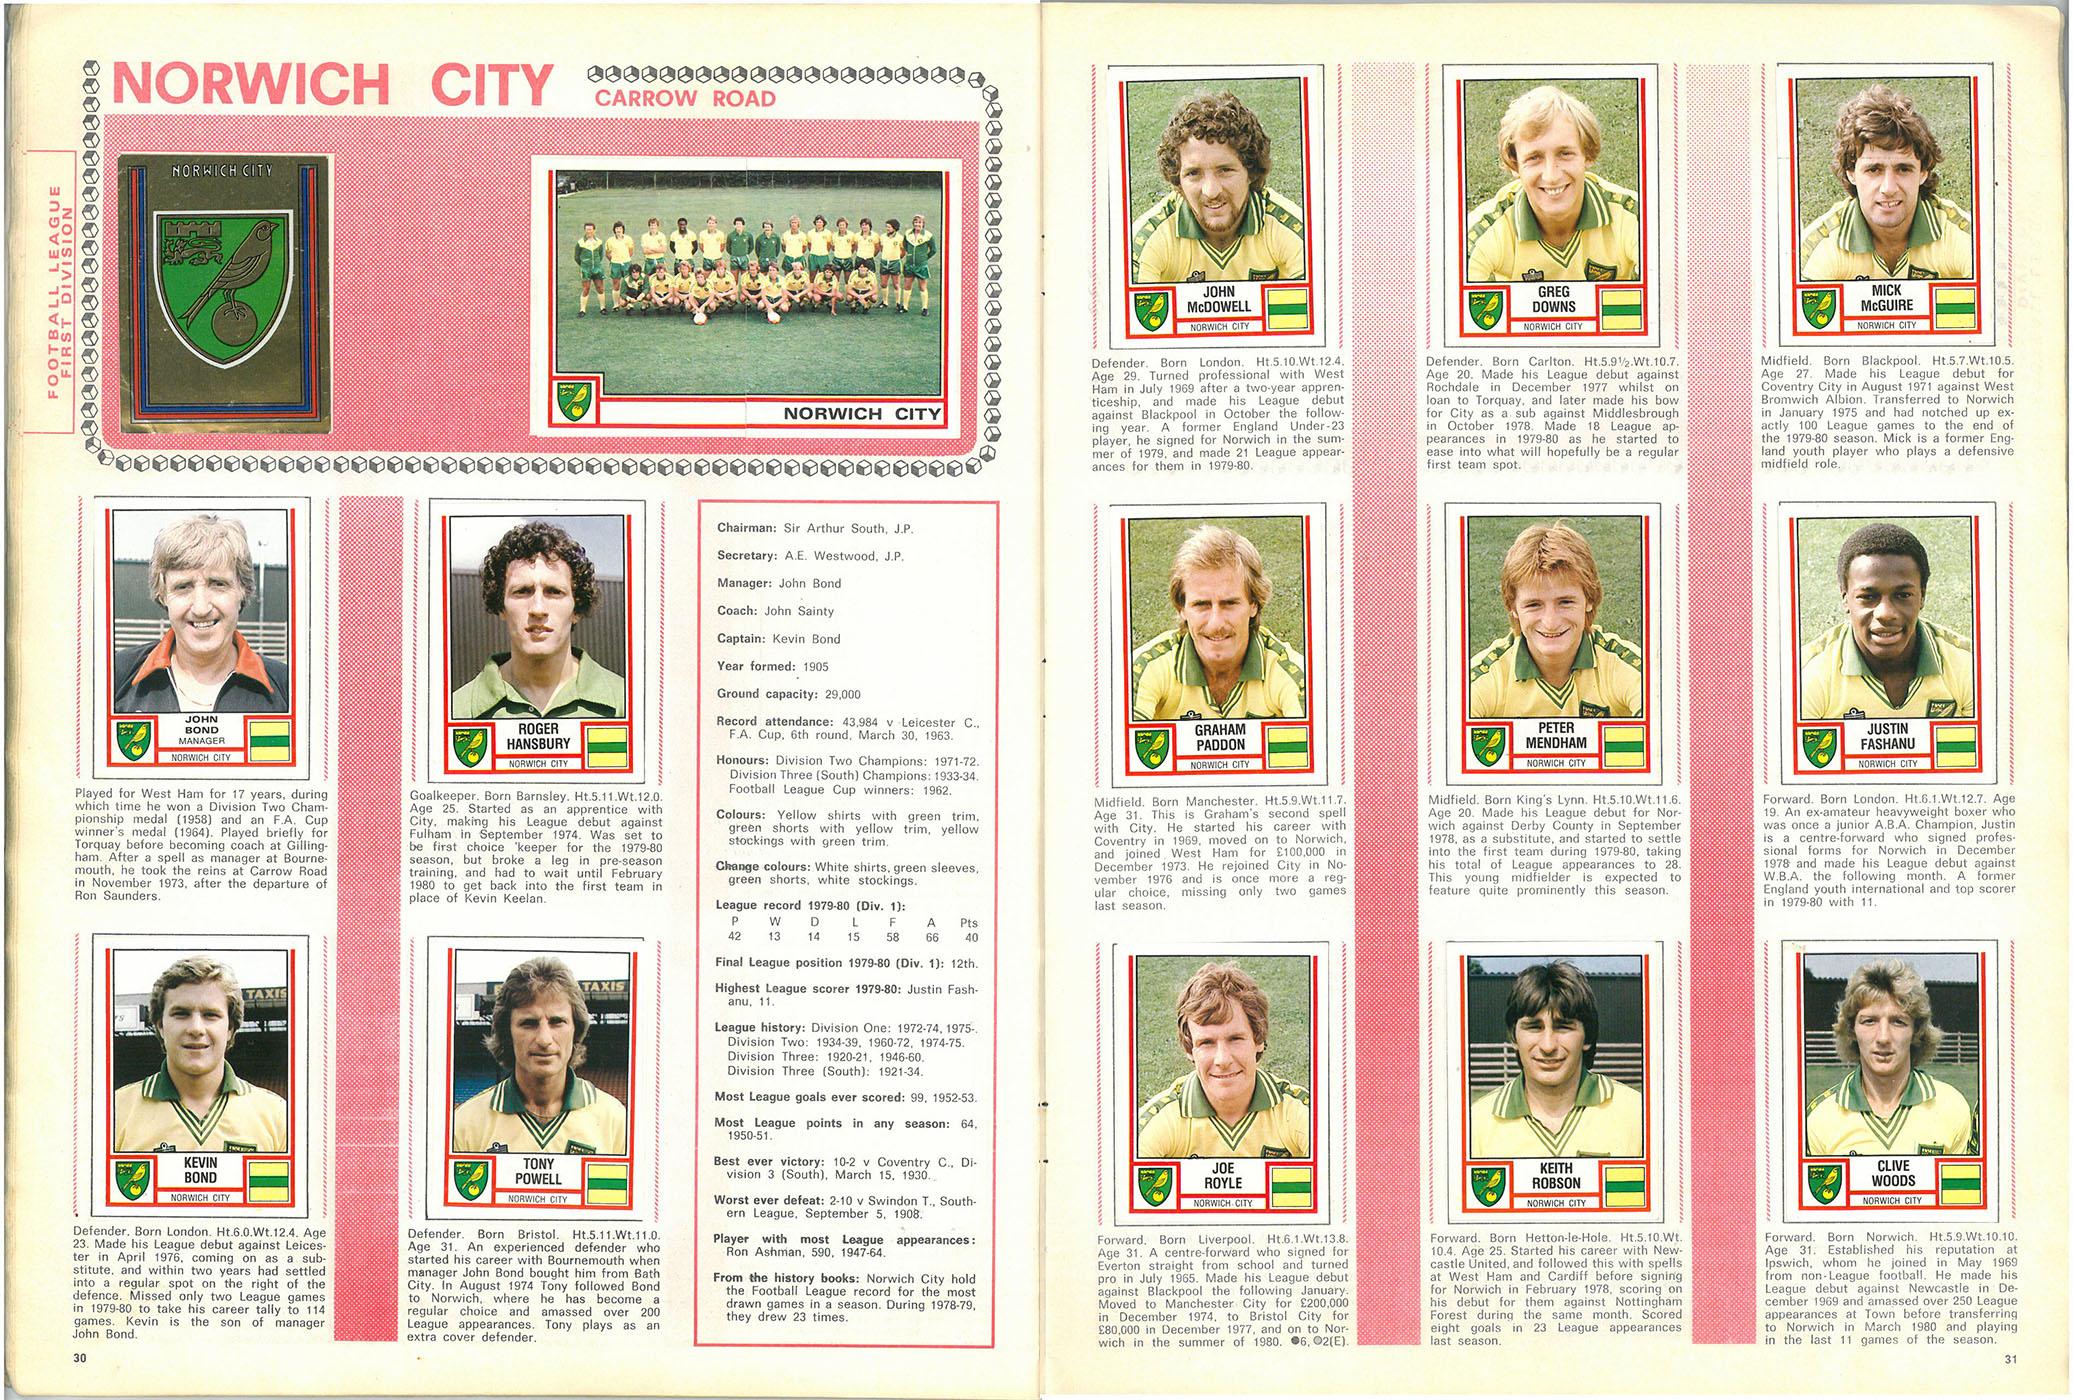 Norwich City 1981